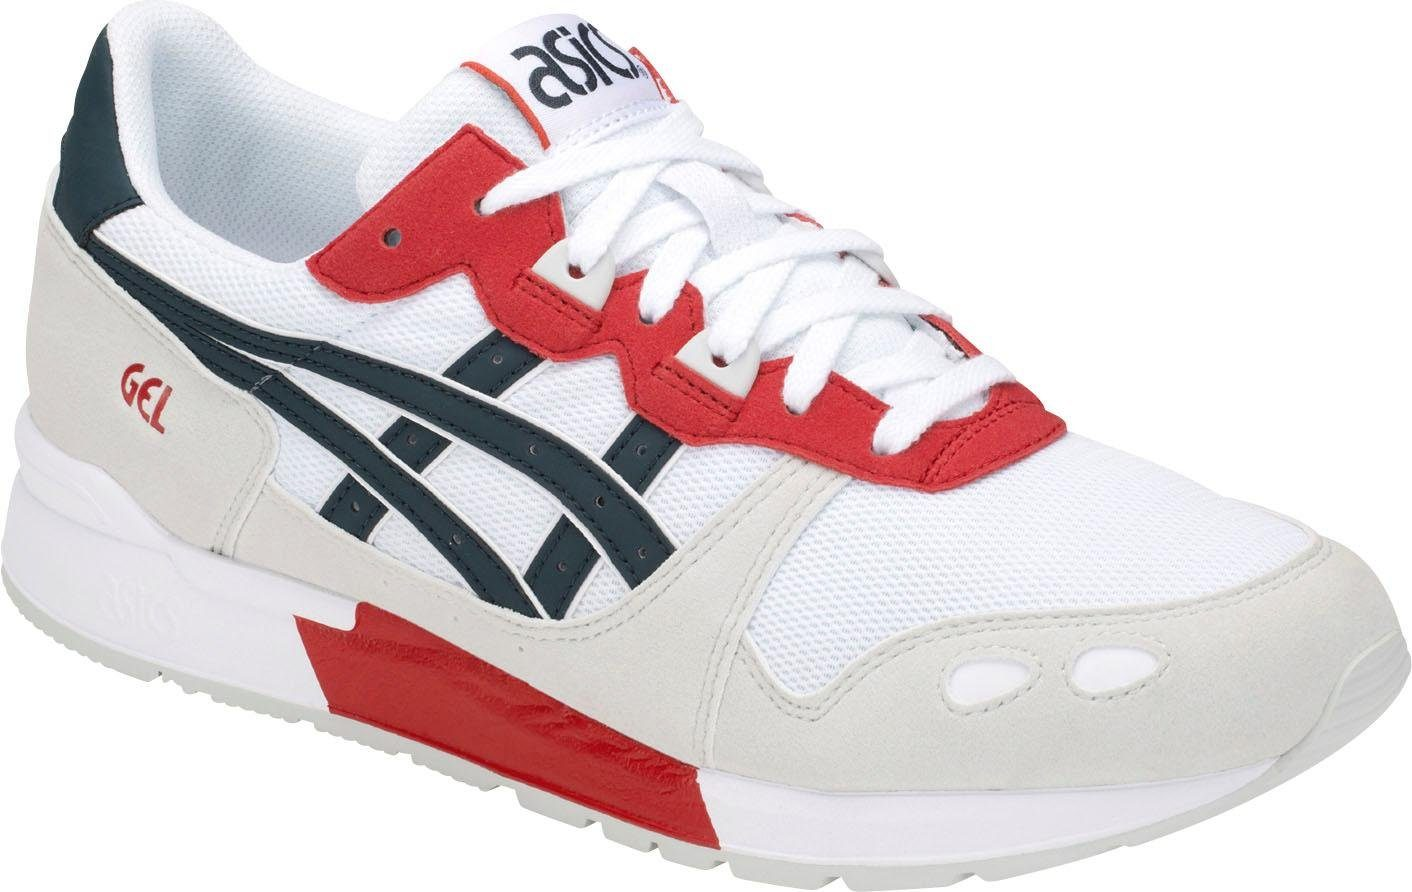 ASICS SportStyle »GEL LYTE M« Sneaker, Trendiger Sneaker von Asics SportStyle online kaufen | OTTO